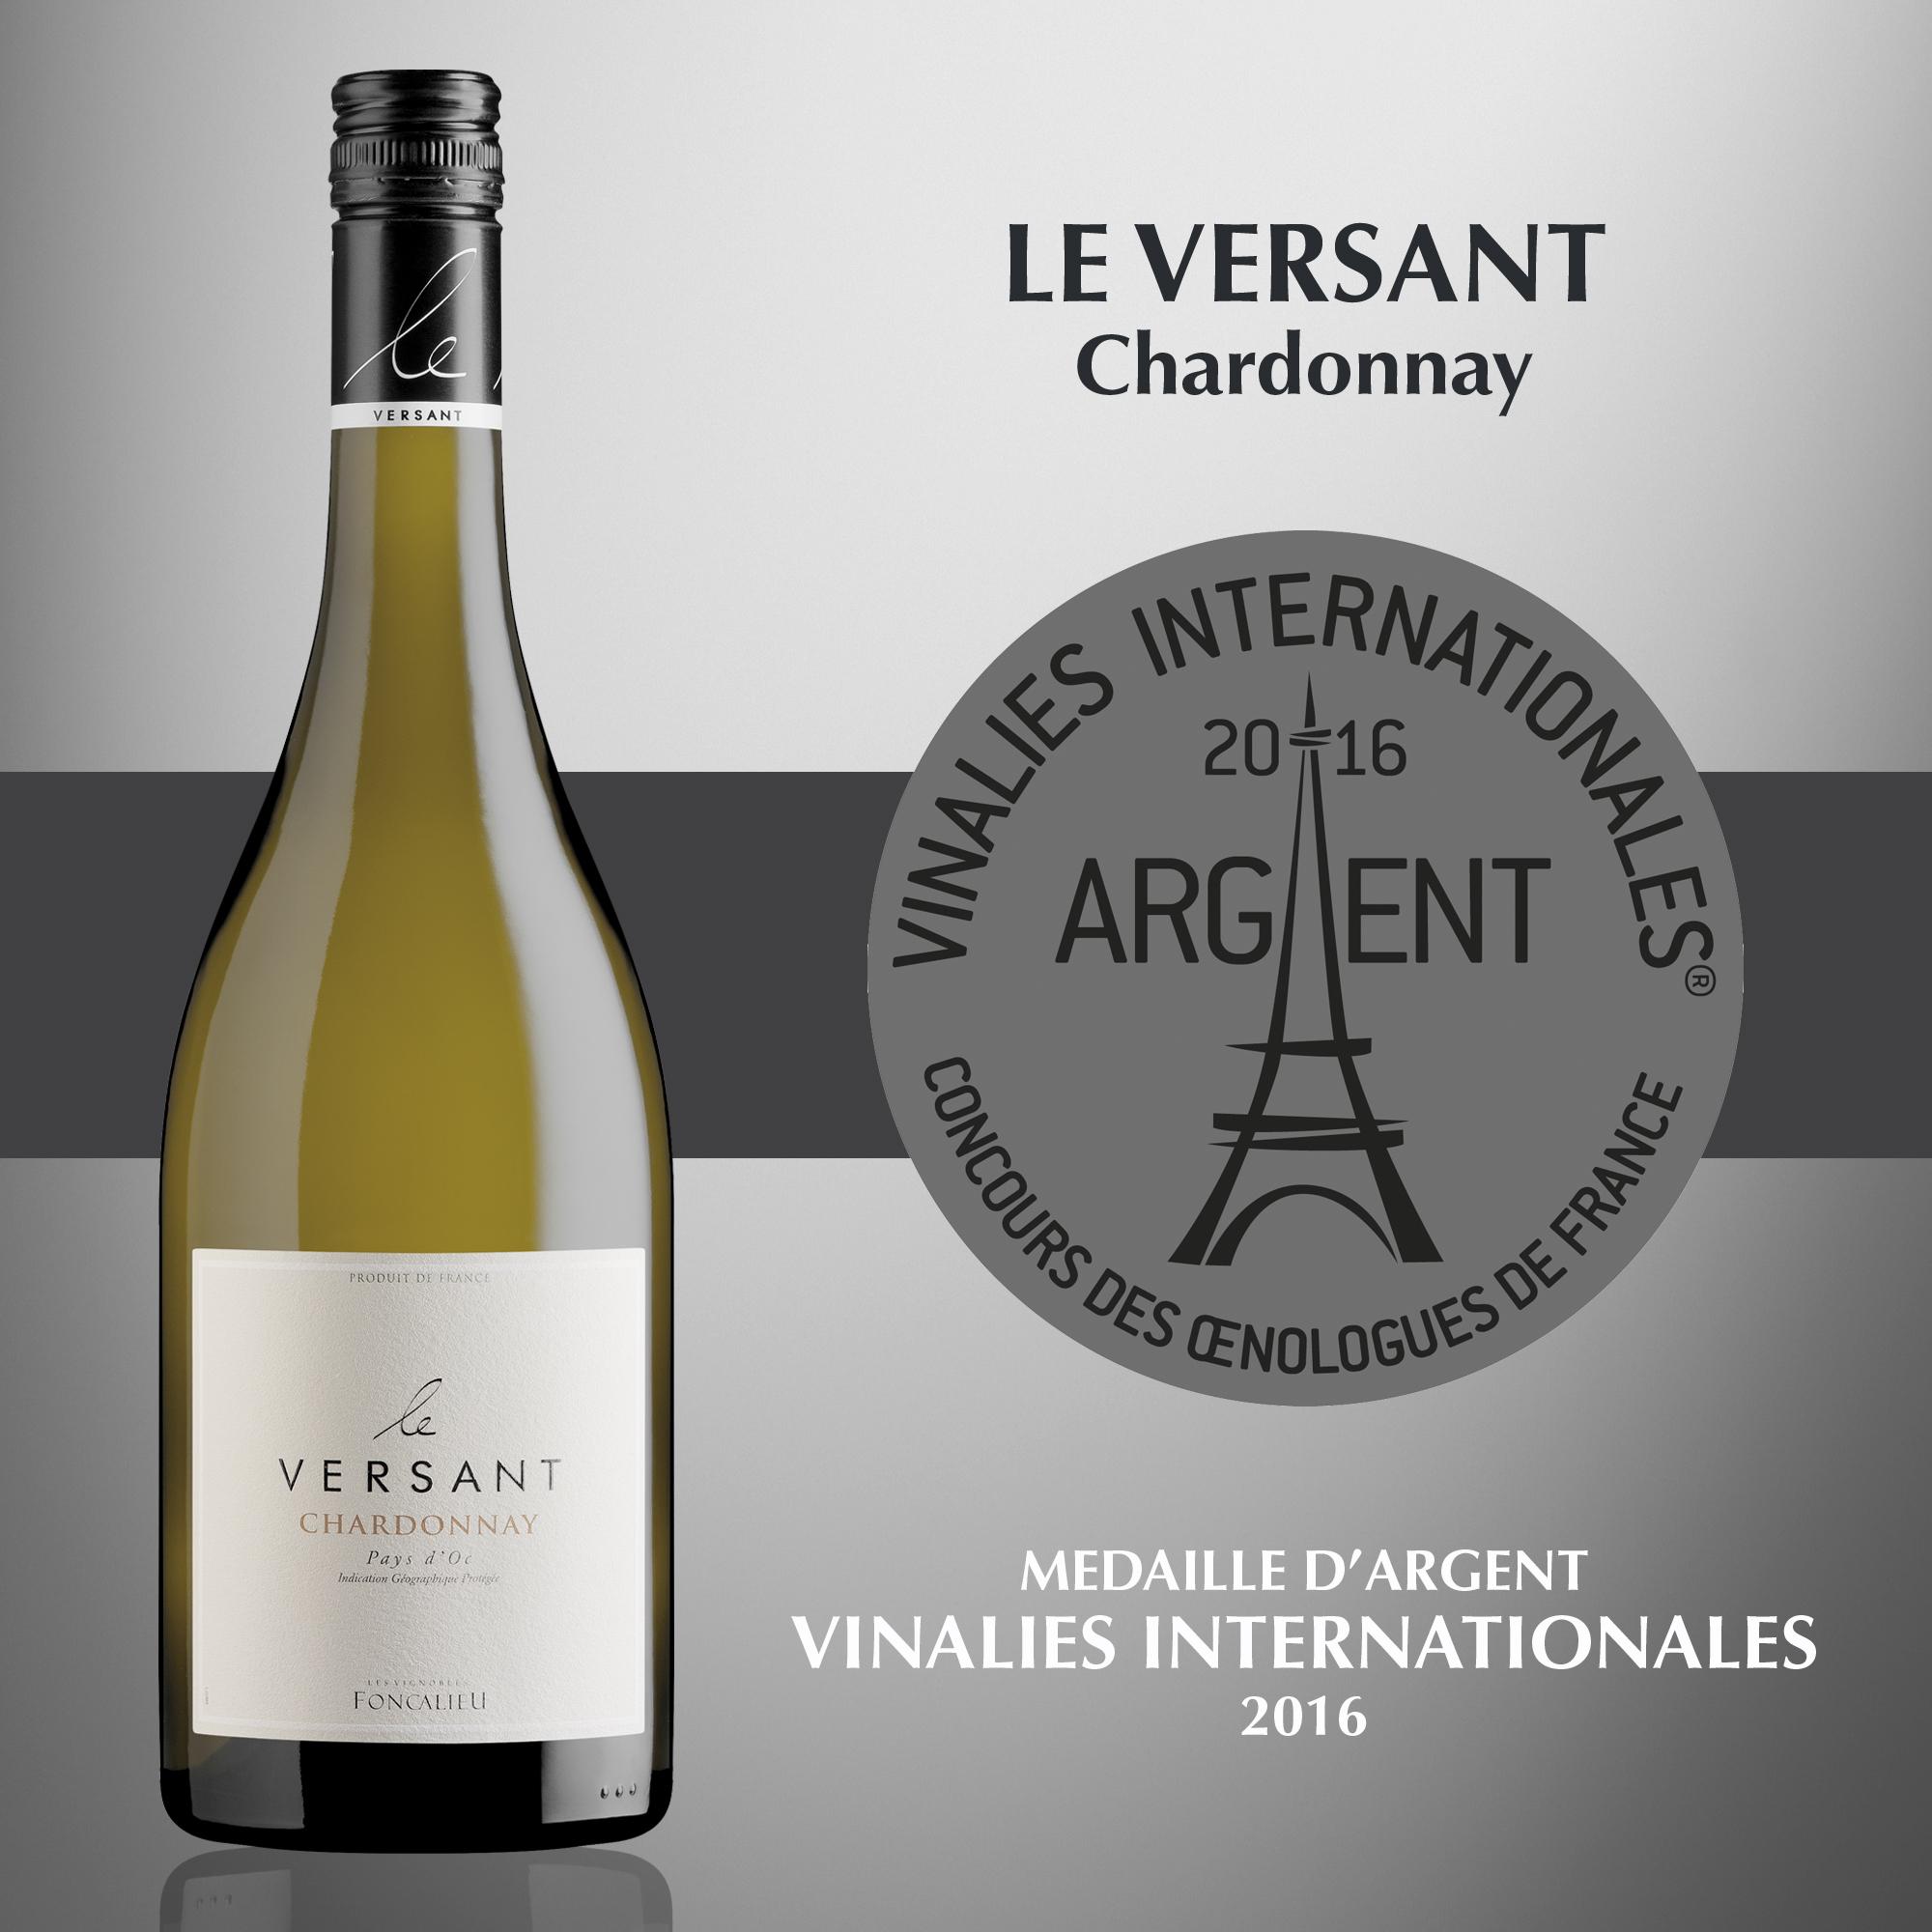 Le Versant Chardonnay - IGP Pays d'Oc